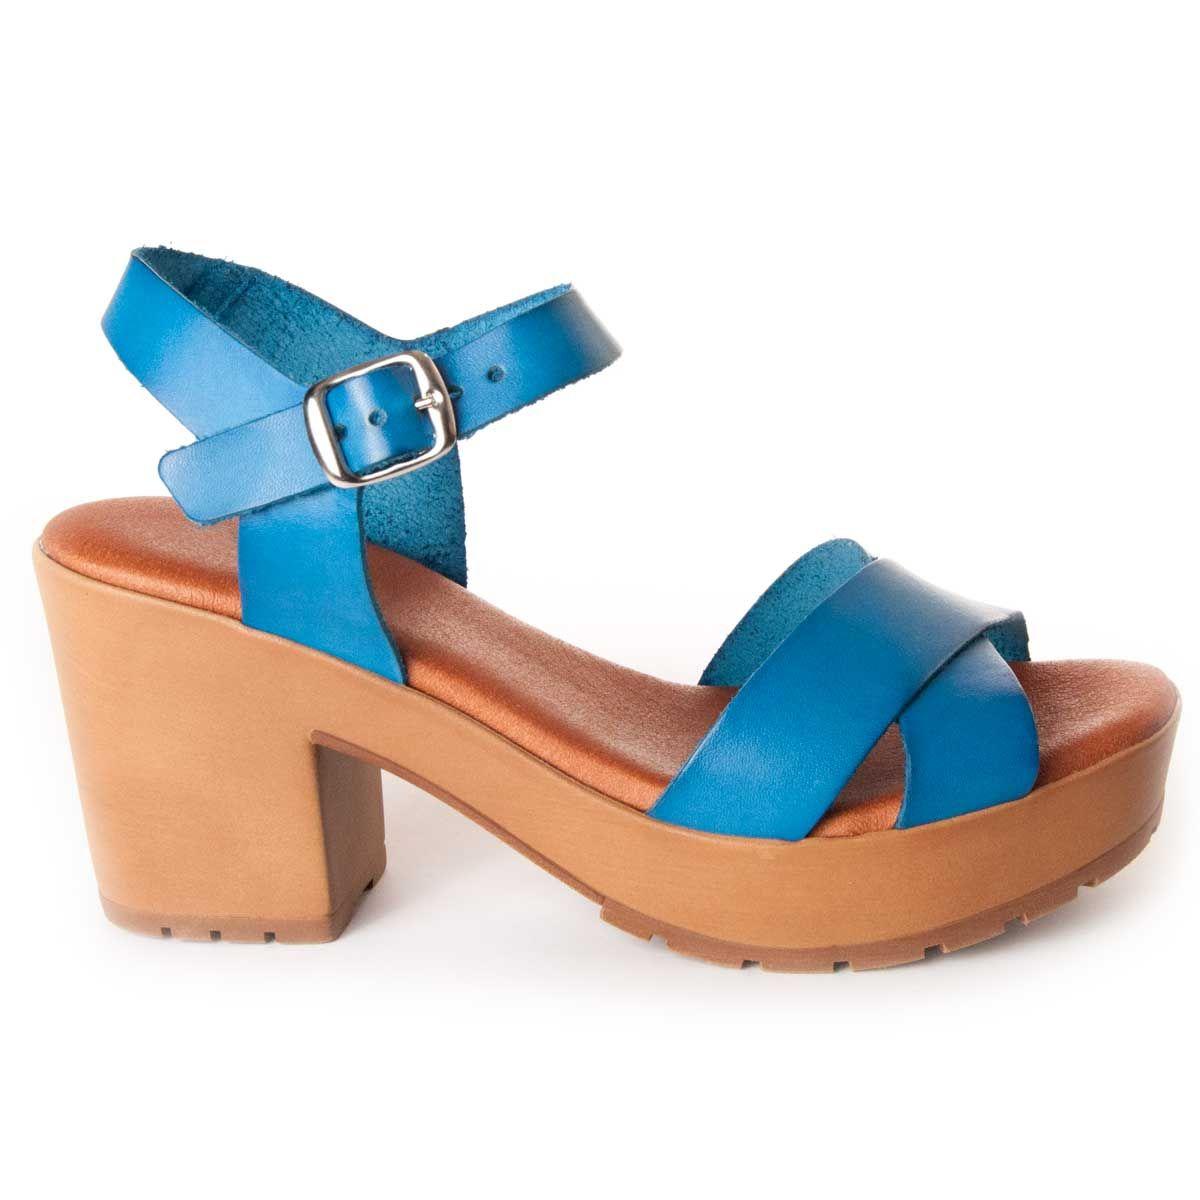 Leindia Platform Sandal in Blue